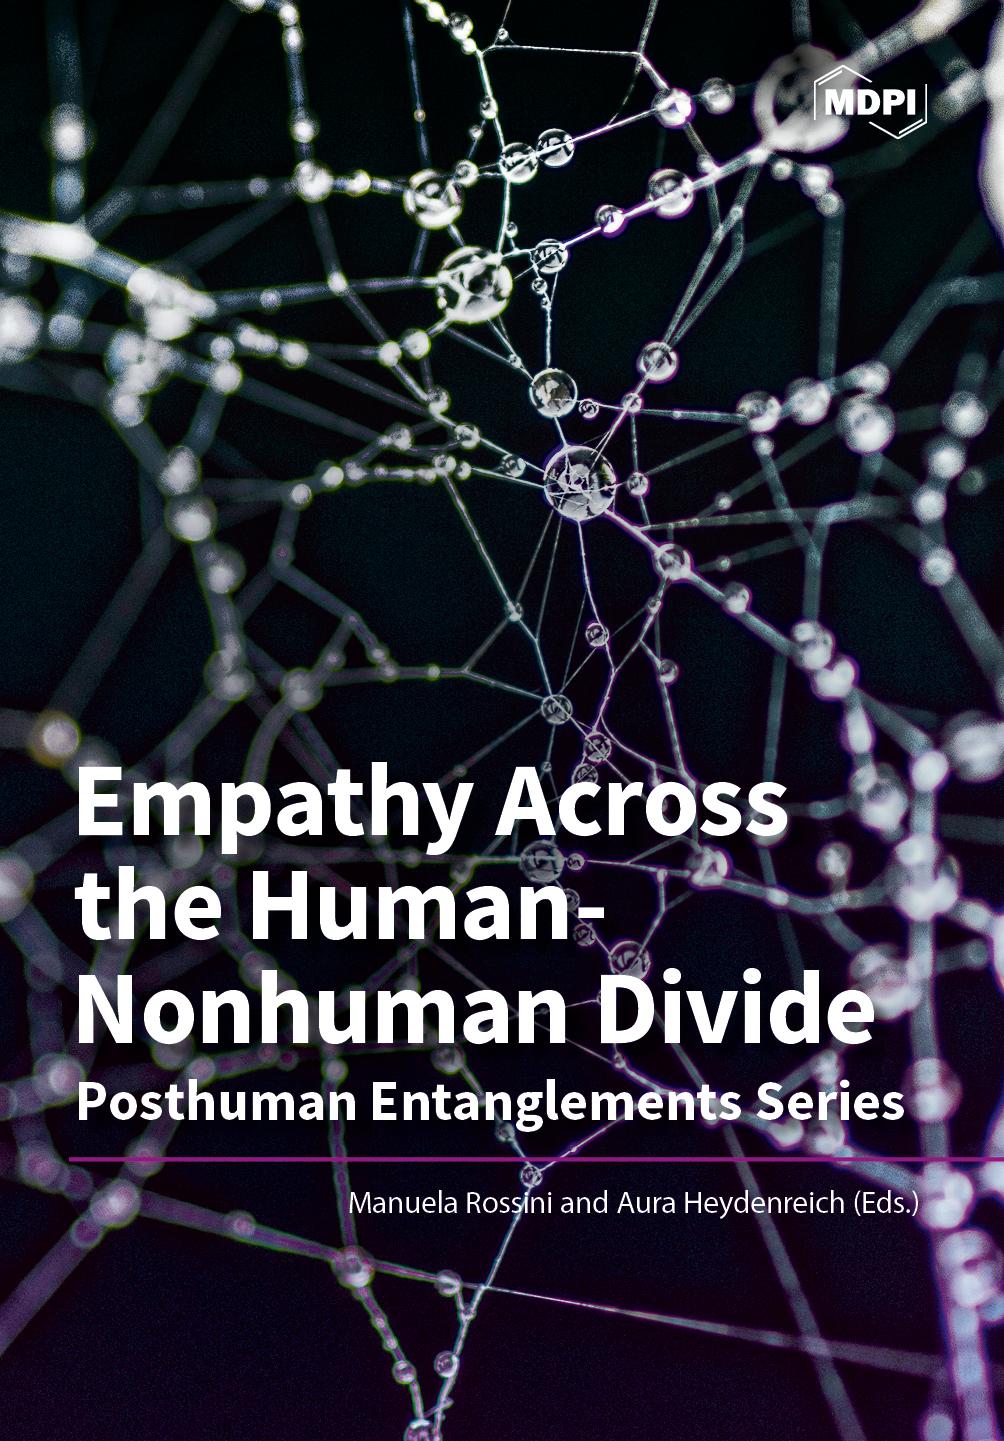 Empathy Across the Human-Nonhuman Dividexas